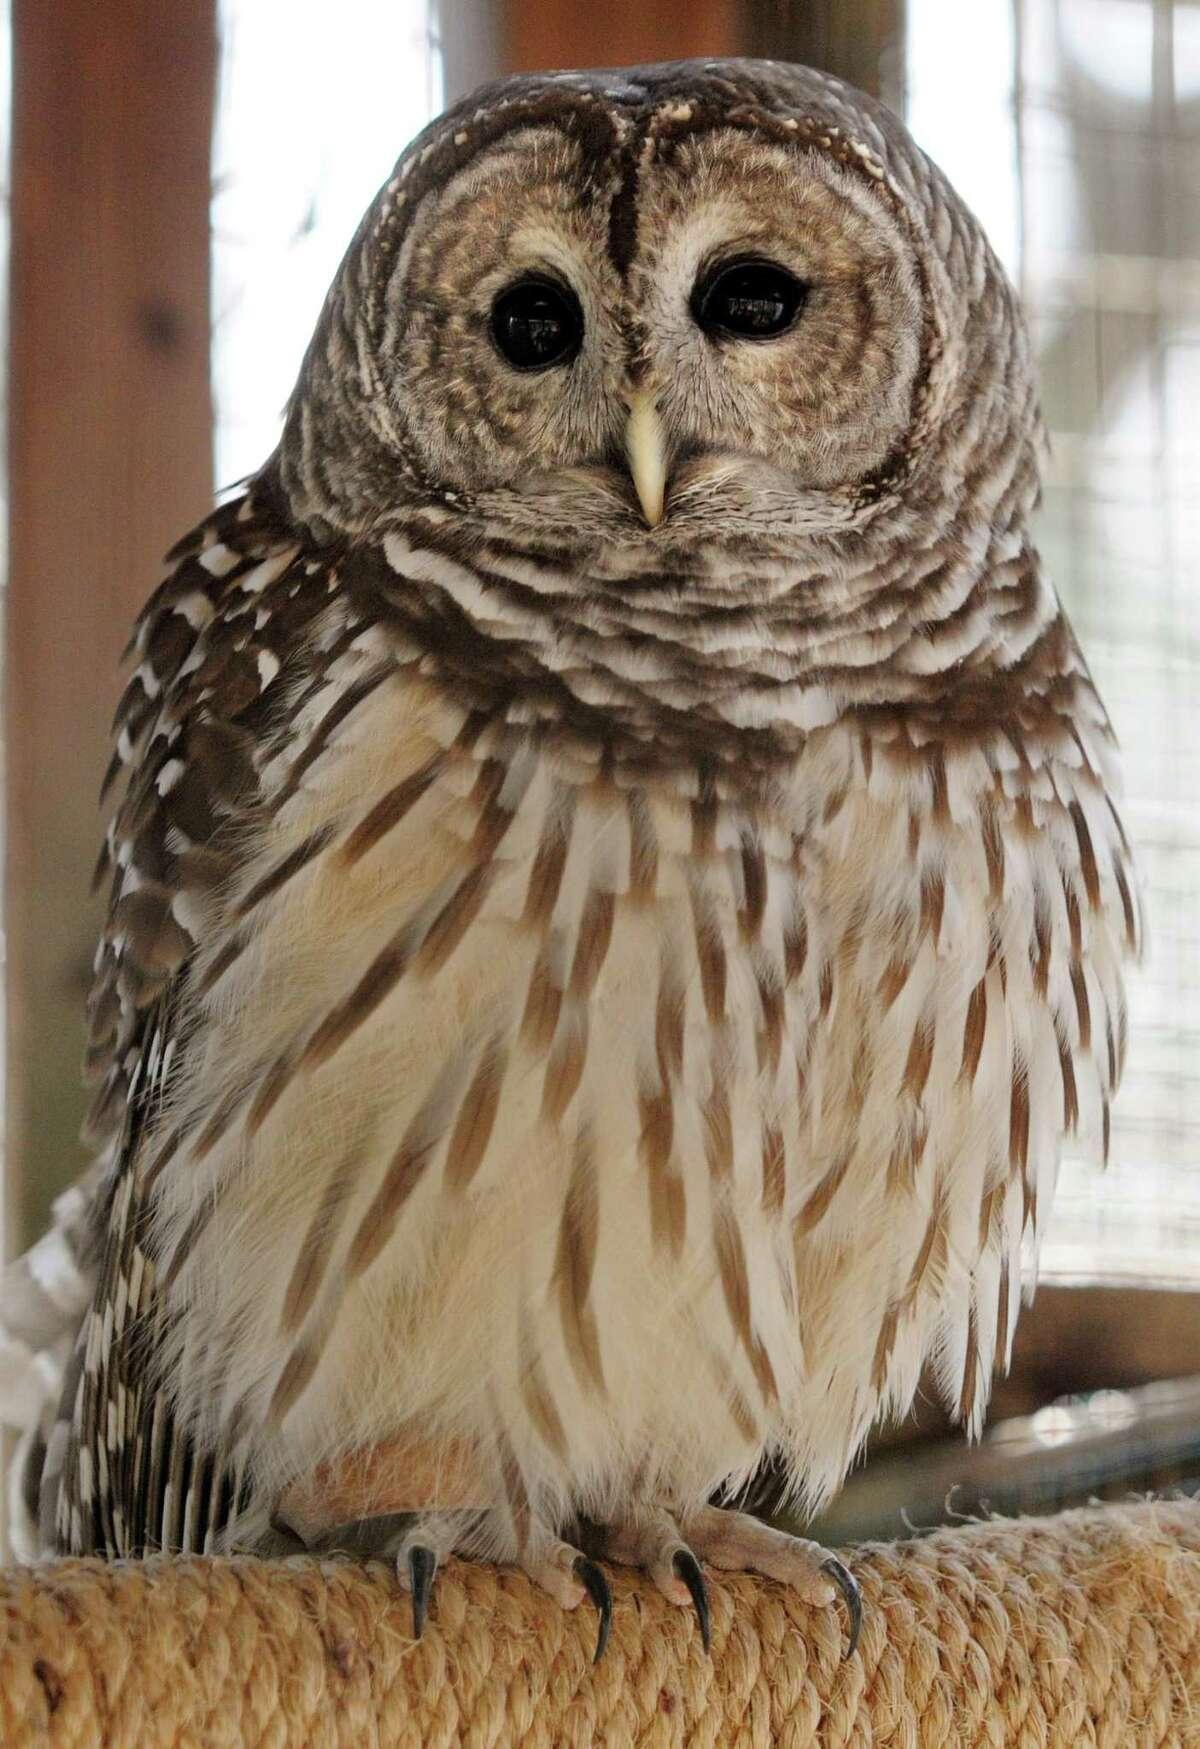 A Barred Owl at the Connecticut Audubon Society in Fairfield.